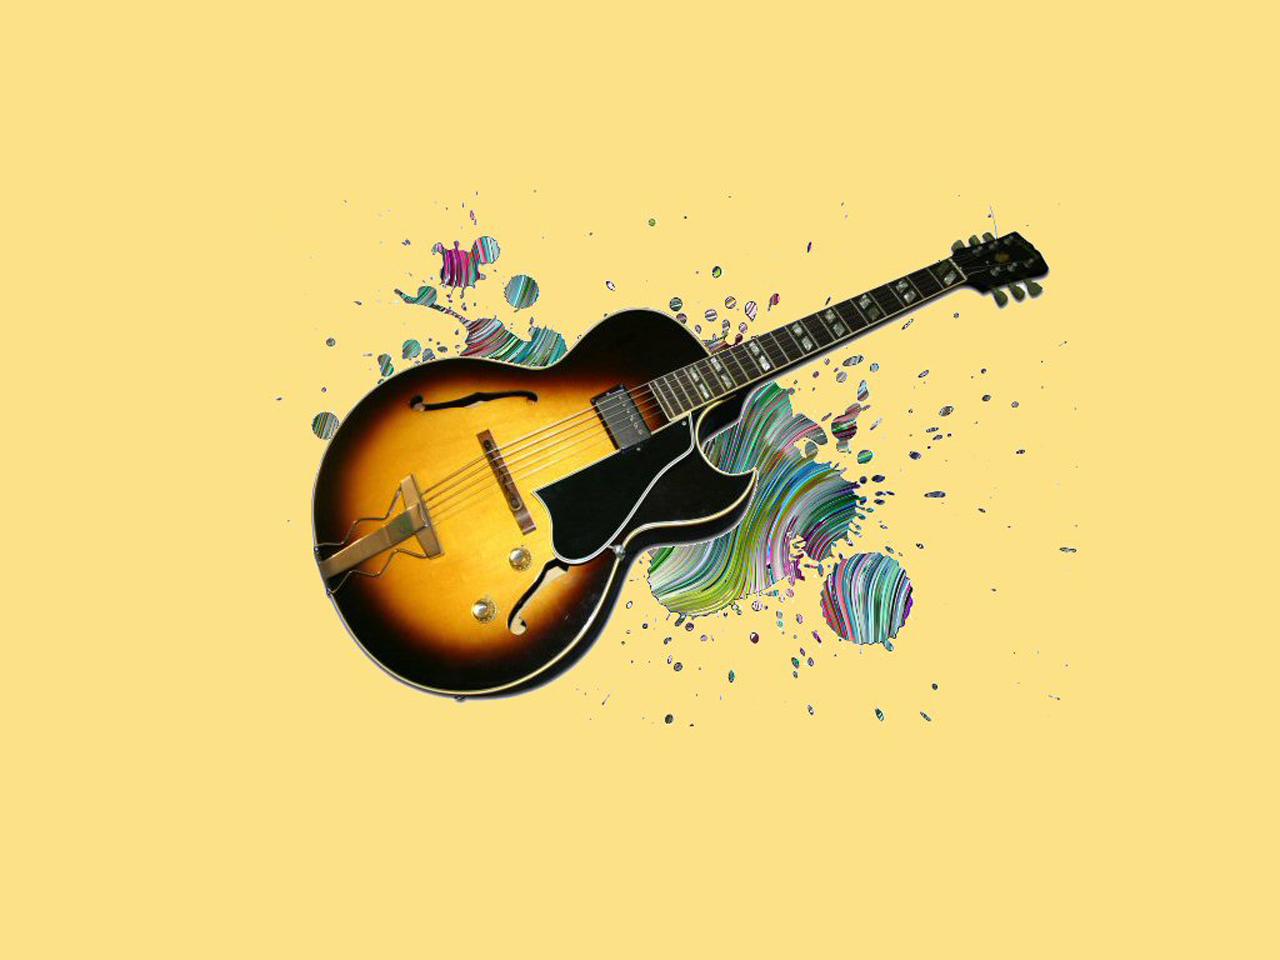 Beautiful Wallpaper Music Trippy - awesome-guitar-wallpapers-designs-large-2  Image_474644.jpg?ssl\u003d1